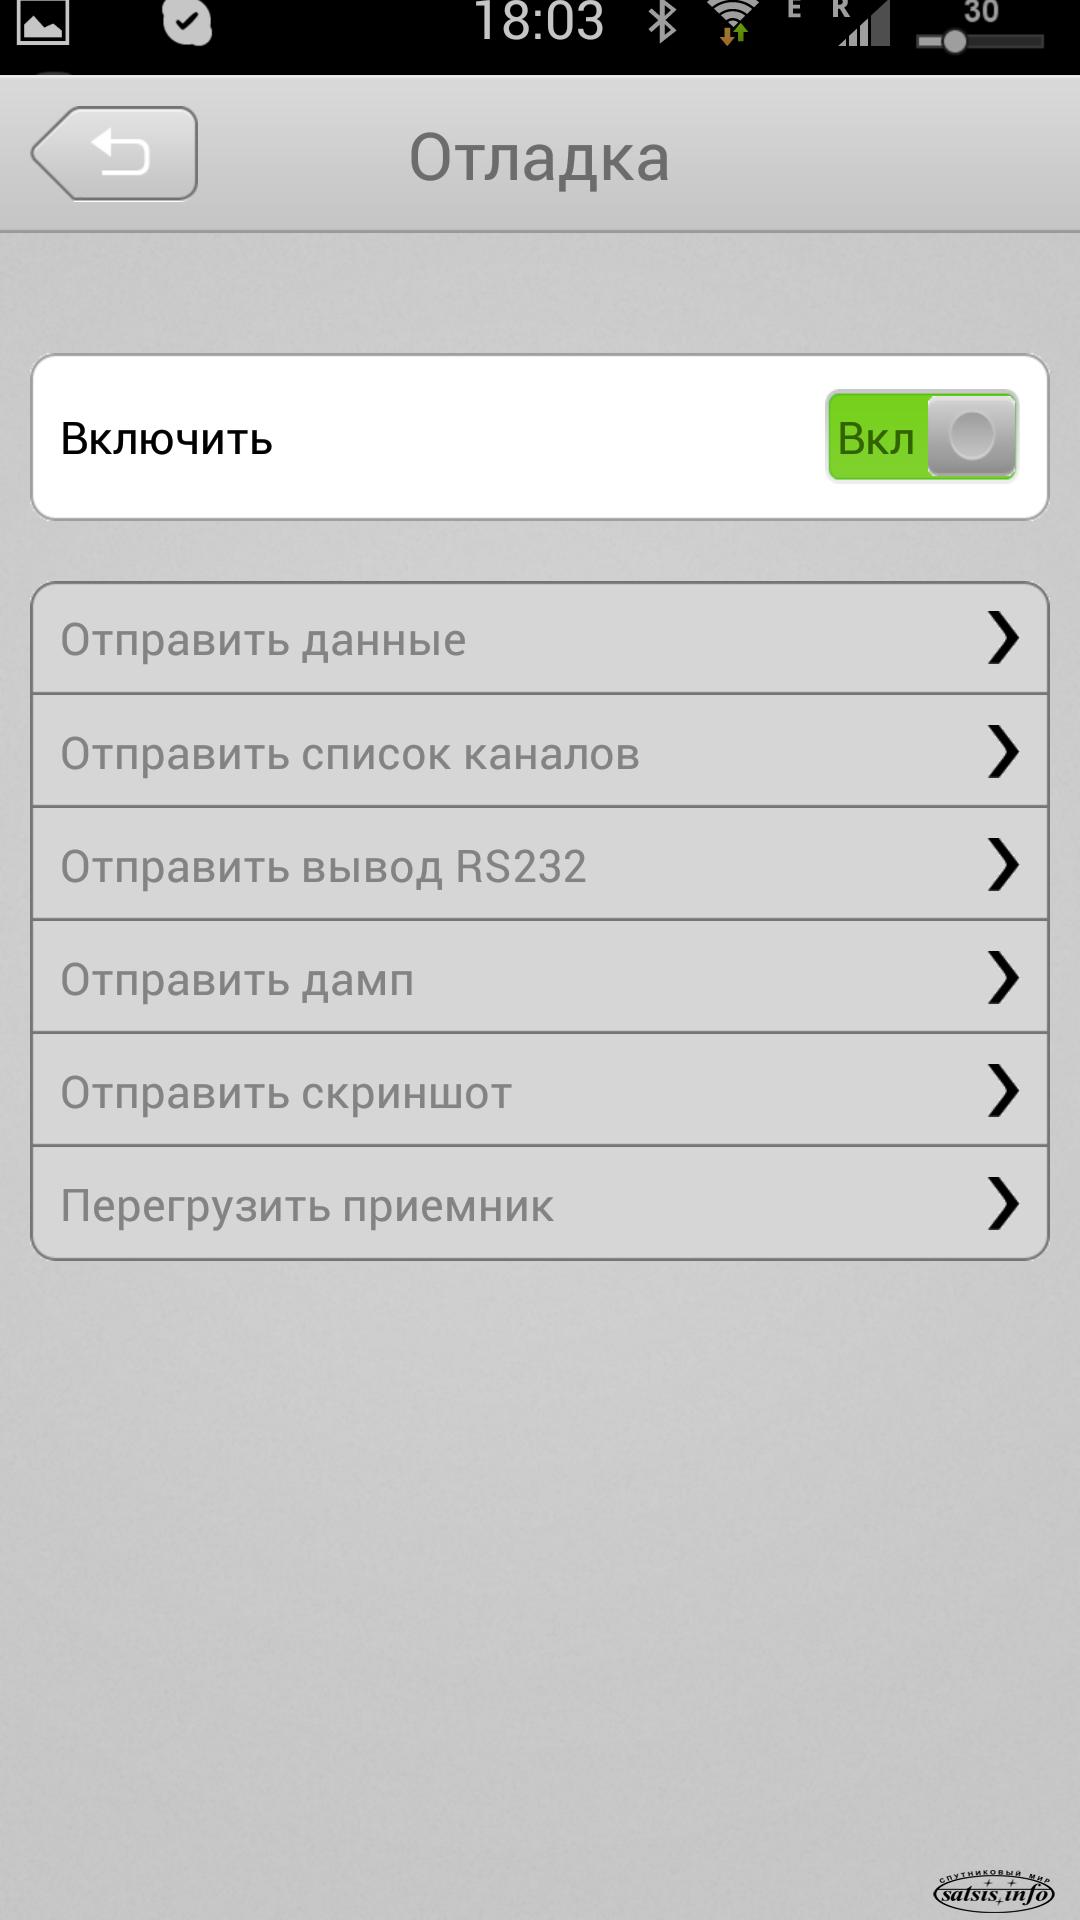 https://satsis.info/uploads/forum/posts/2014-06/1401808322_www.satsis.info_g_mscreen_10.png